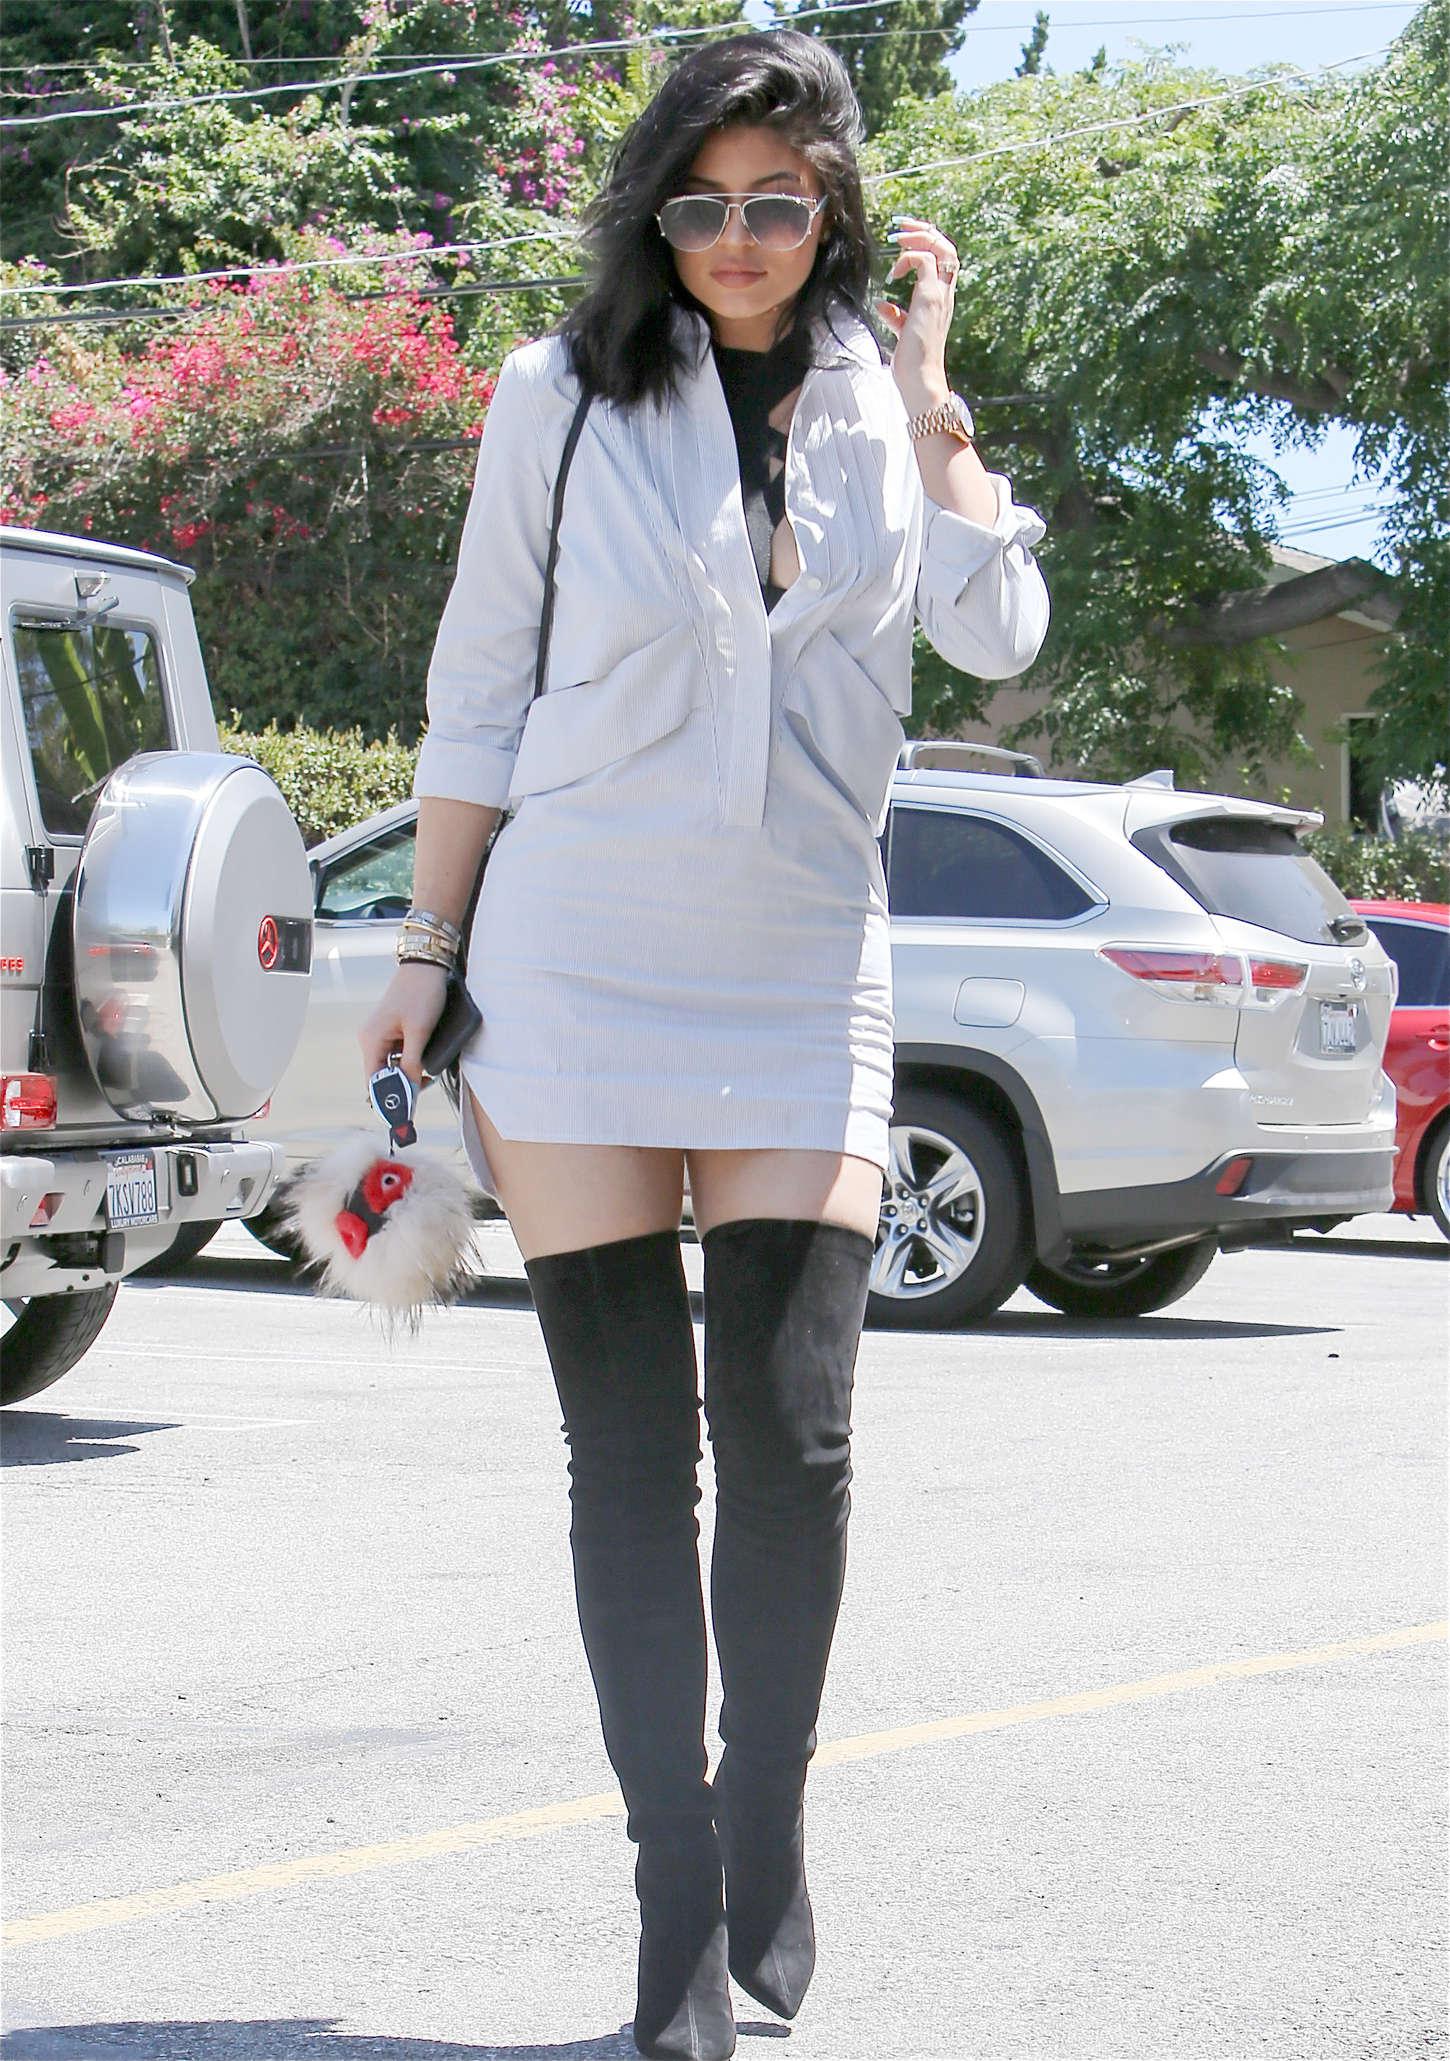 Kylie Jenner 2015 : Kylie Jenner in Mini Dress -04